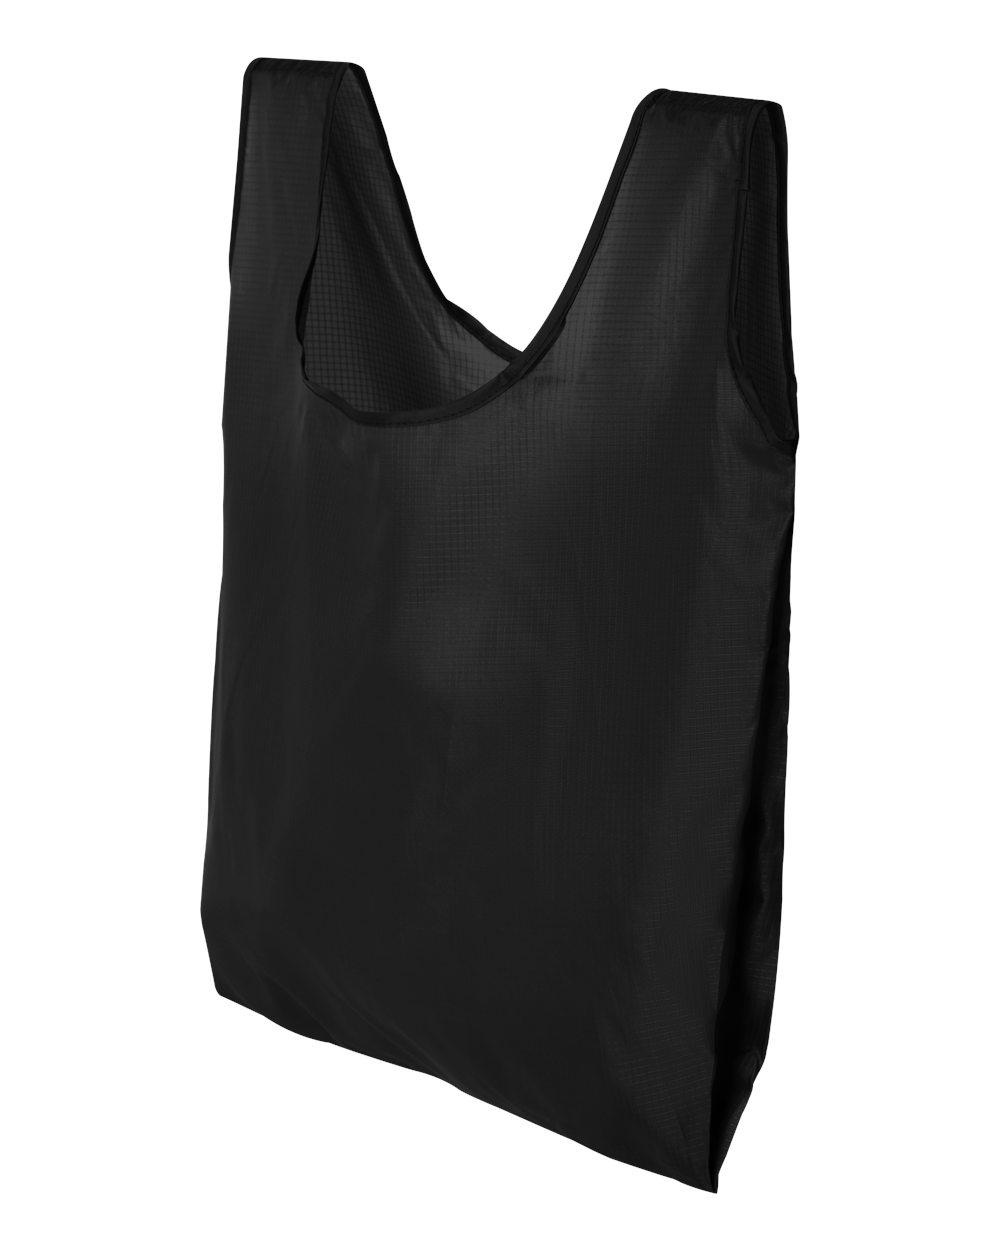 Top Shop Black Reusable Shopping Bag From Liberty Bags R1500 at ...